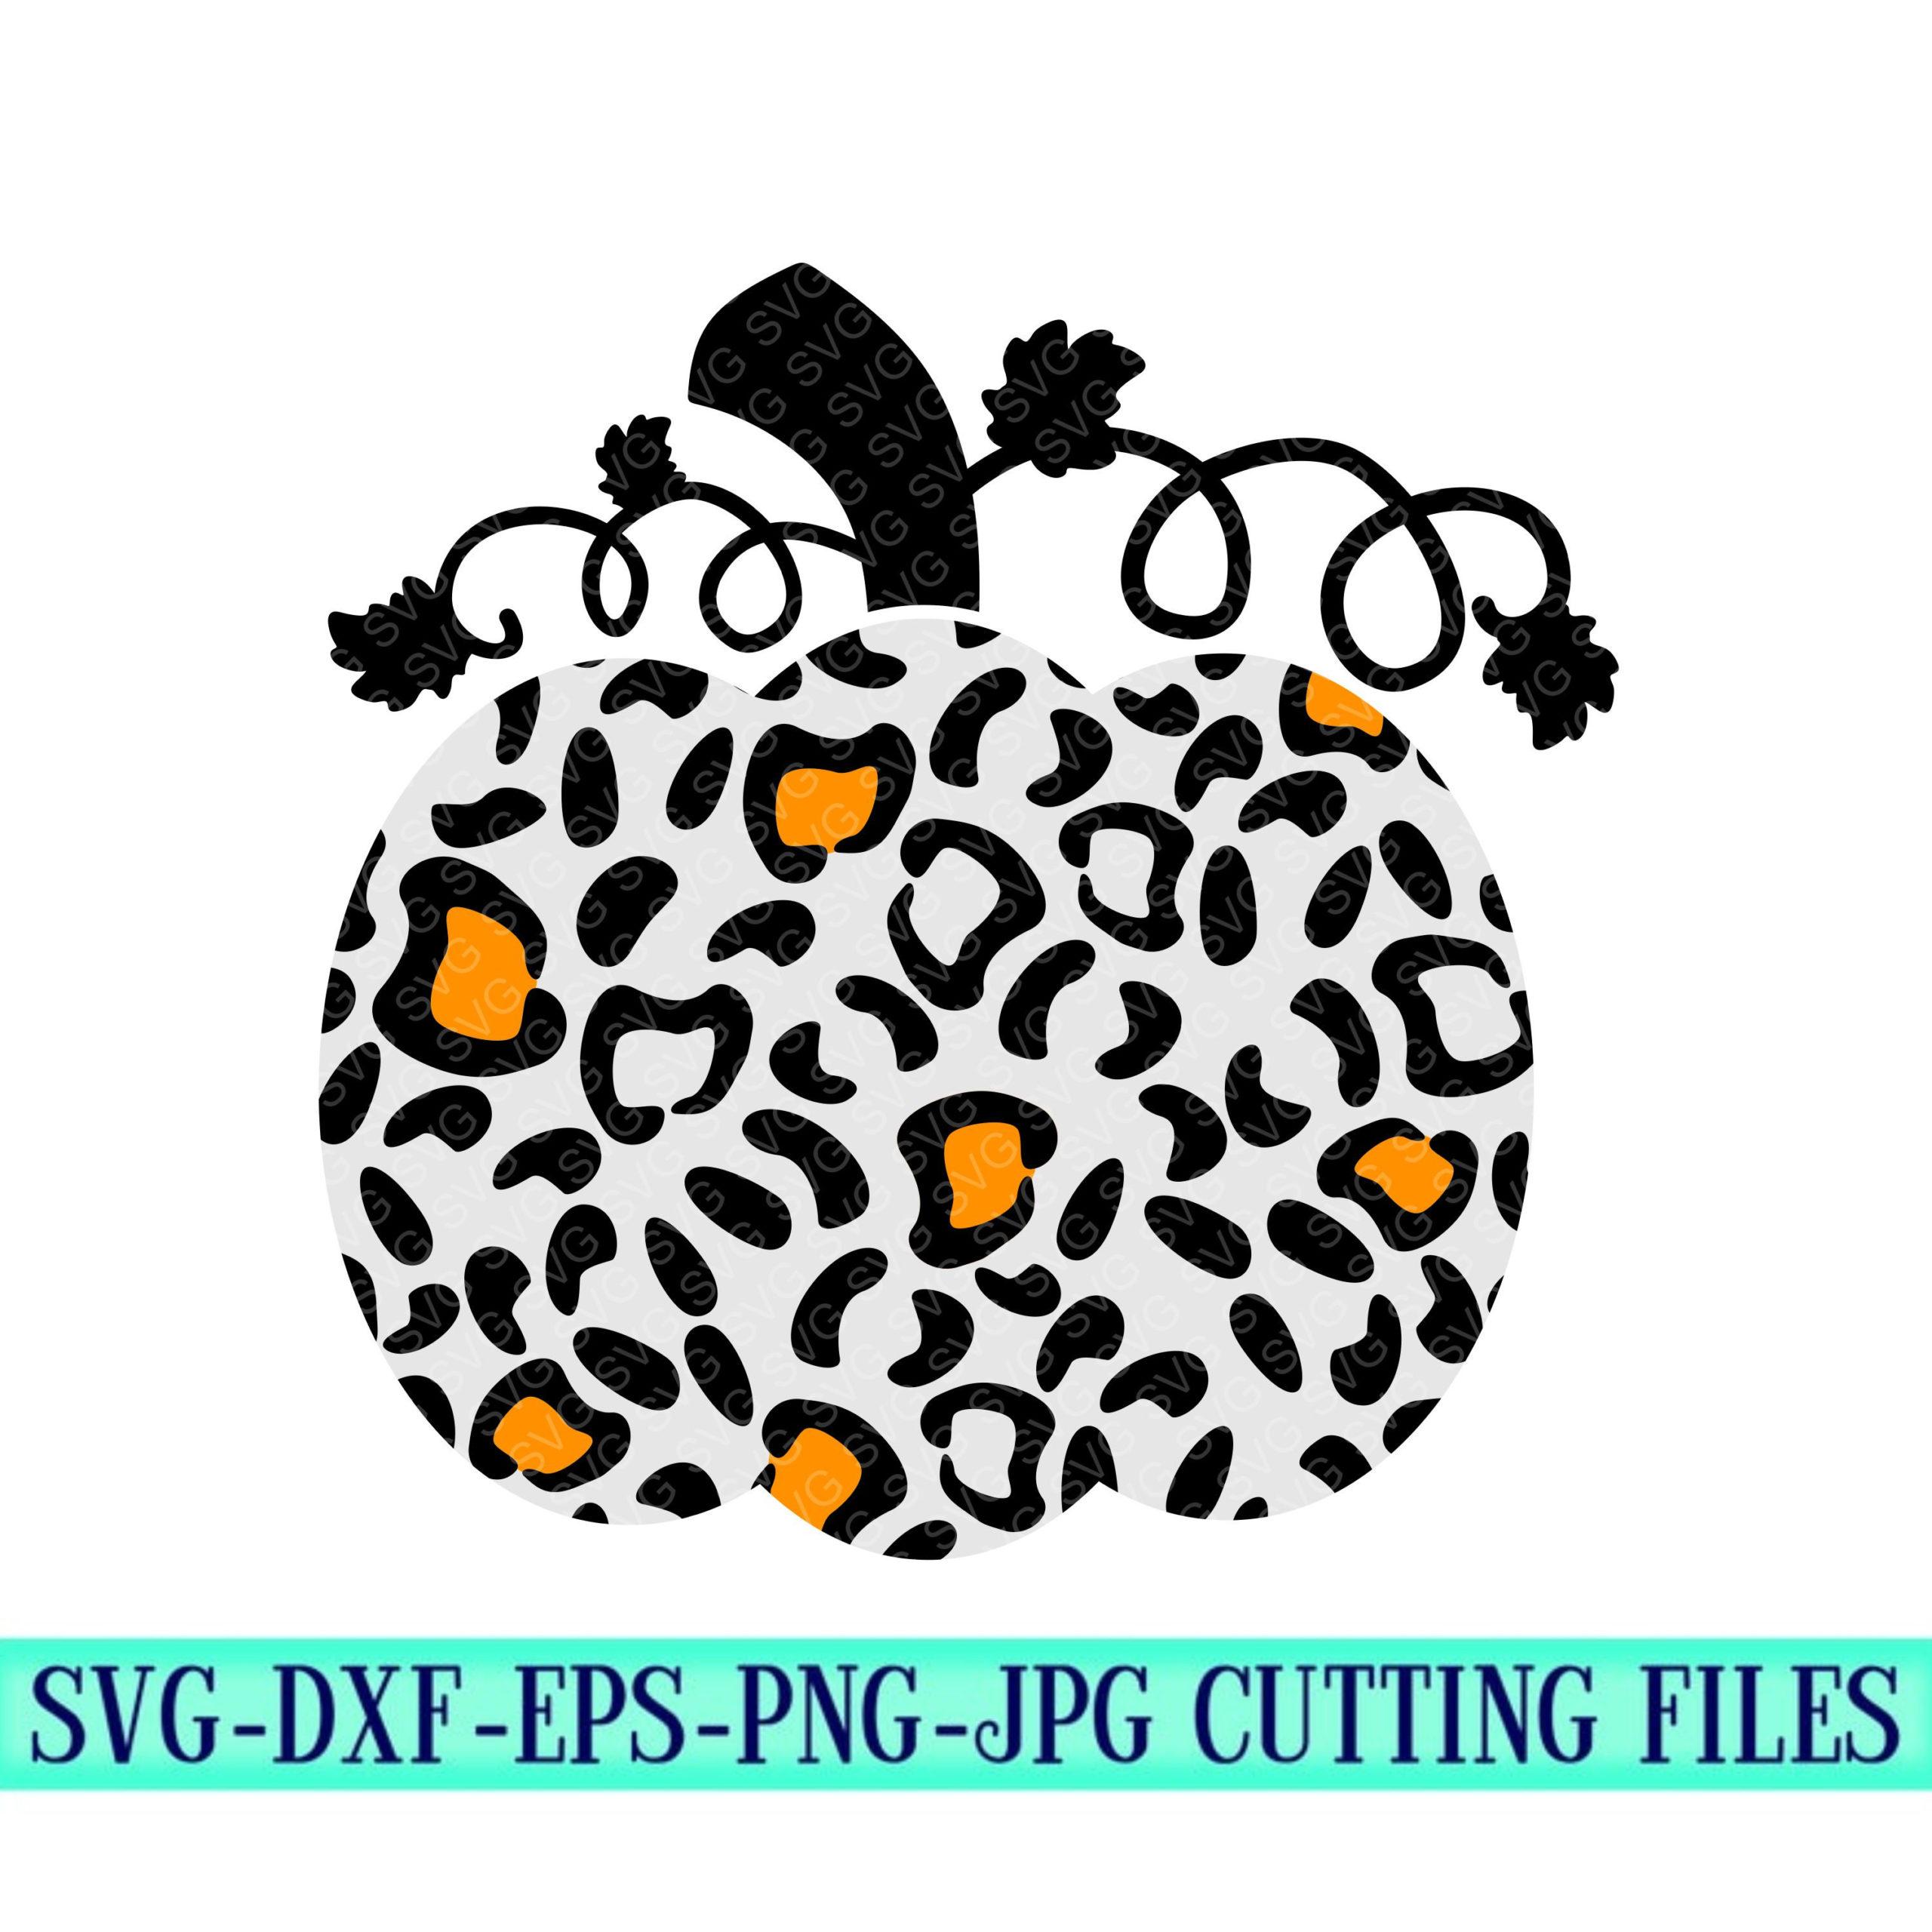 Leopard-pumpkin-svg-pumpkin-svg-fall-svg-halloween-svg-cheetah-pumpkin-svgcheetah-print-svg-fall-svg-design-fall-cut-filescricut-svg-5f6f706d